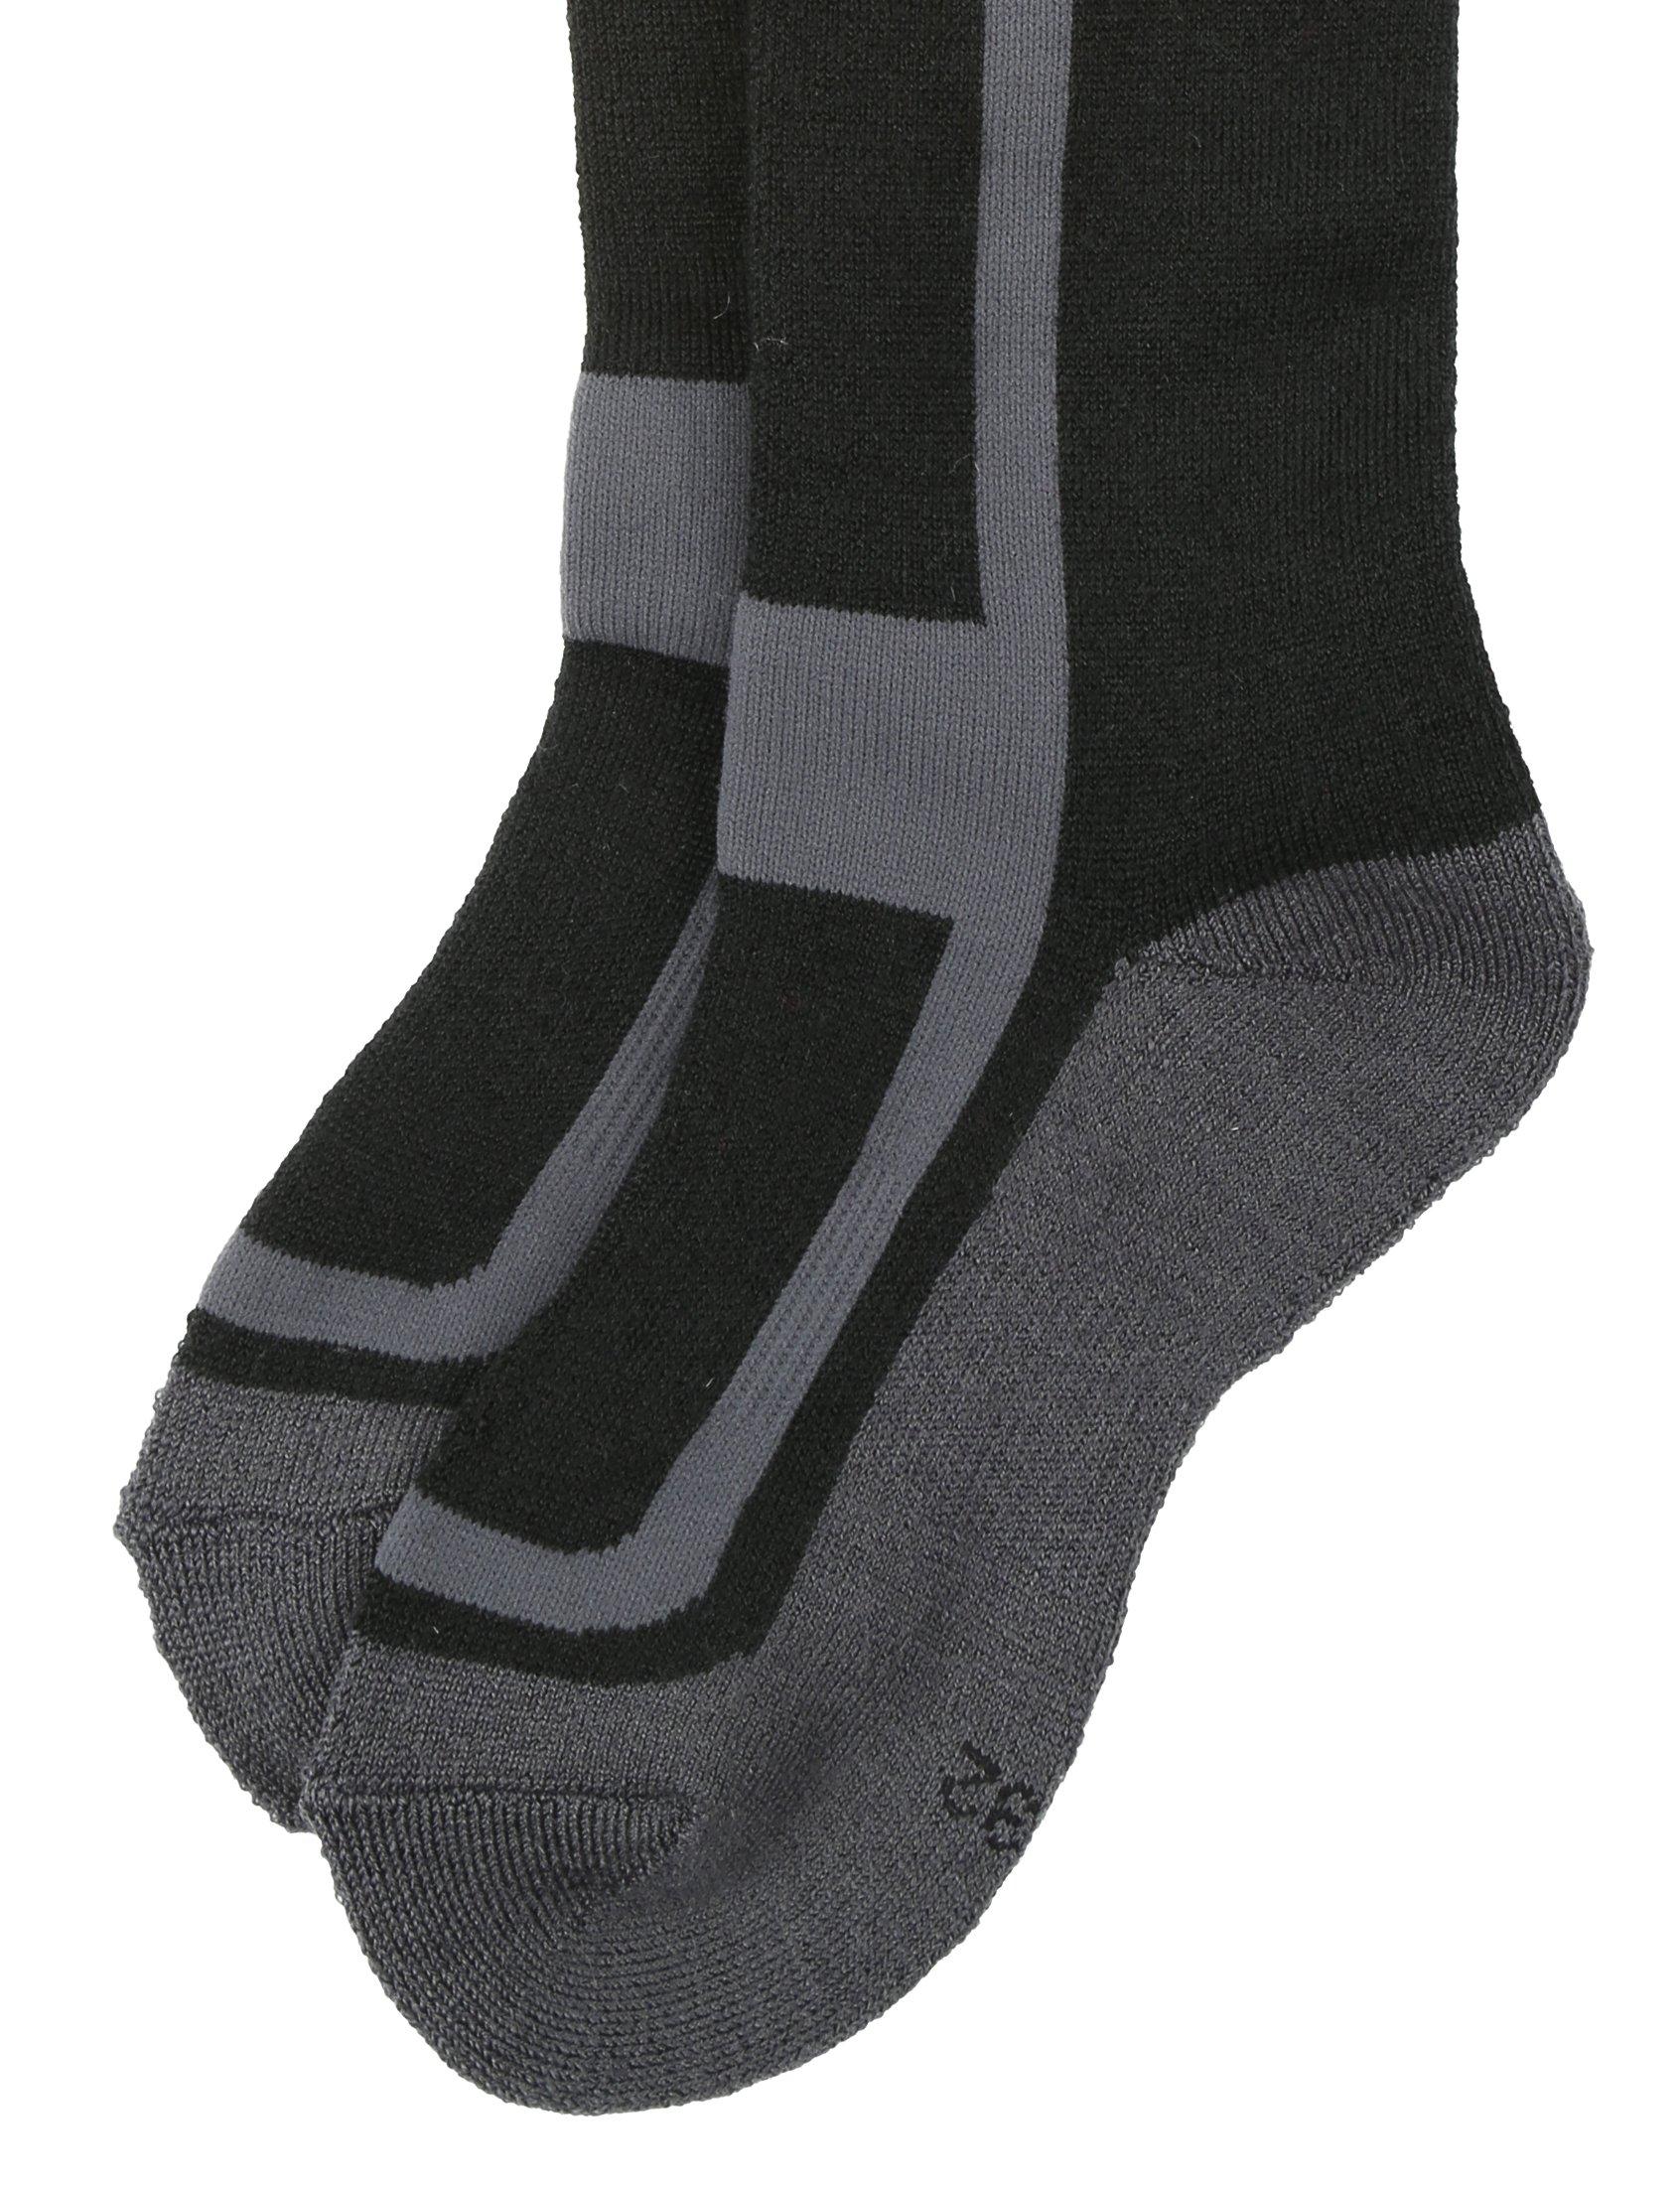 Ultrasport Zigzag Williams Calcetines de esqu/í para ni/ños Pack de 2